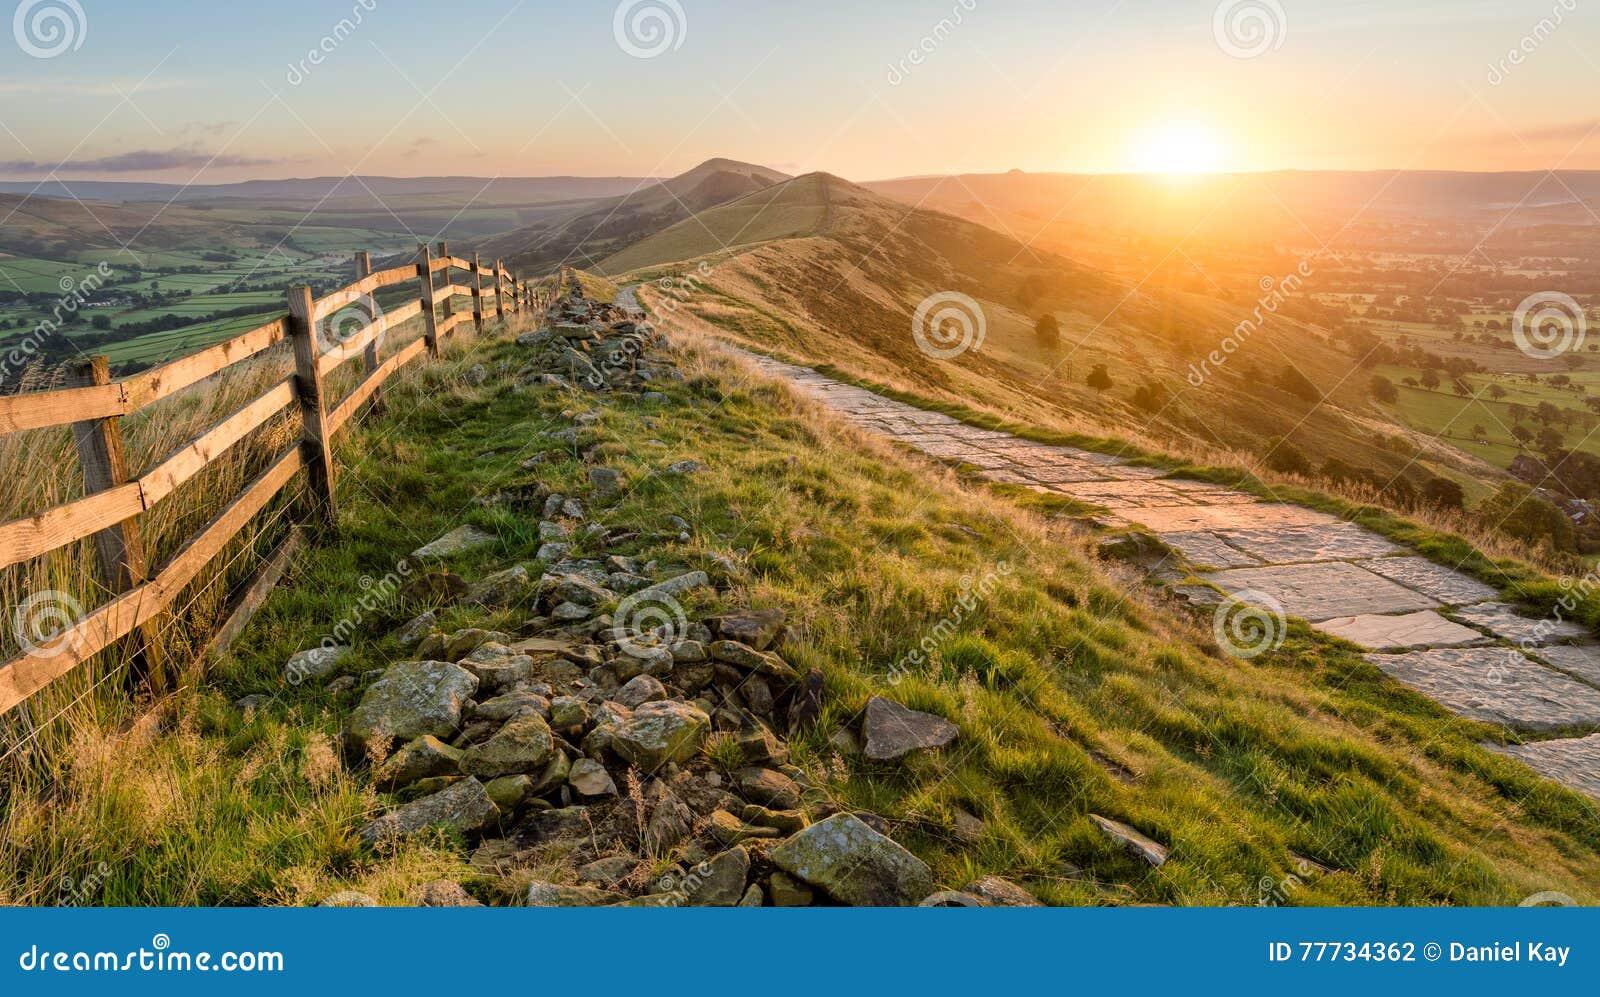 Mooie trillende zonsopgang met steenweg